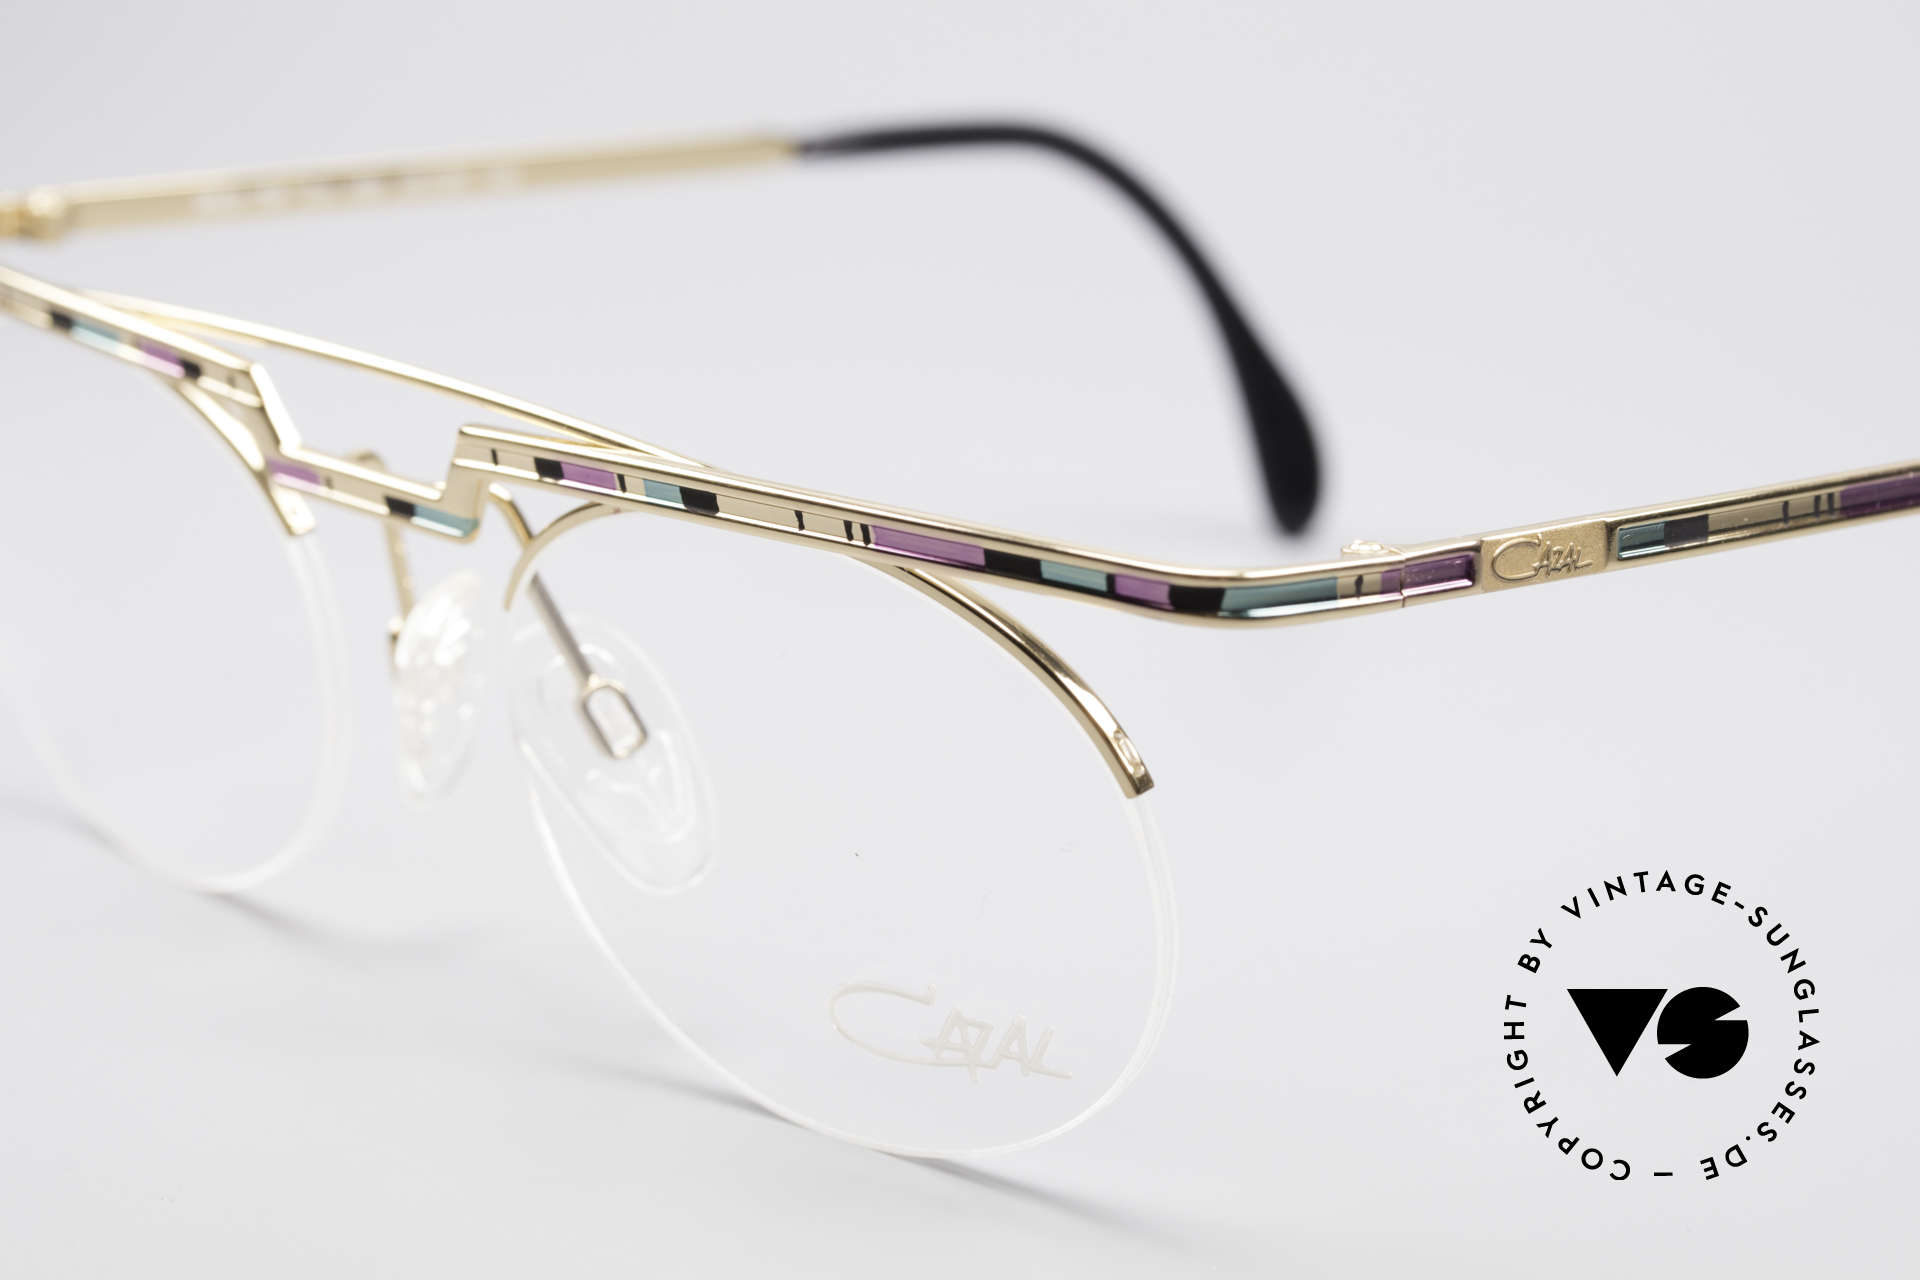 Cazal 758 Original Glasses No Retro Frame, col. description in the old catalog: rosé-mint-black / gold, Made for Men and Women